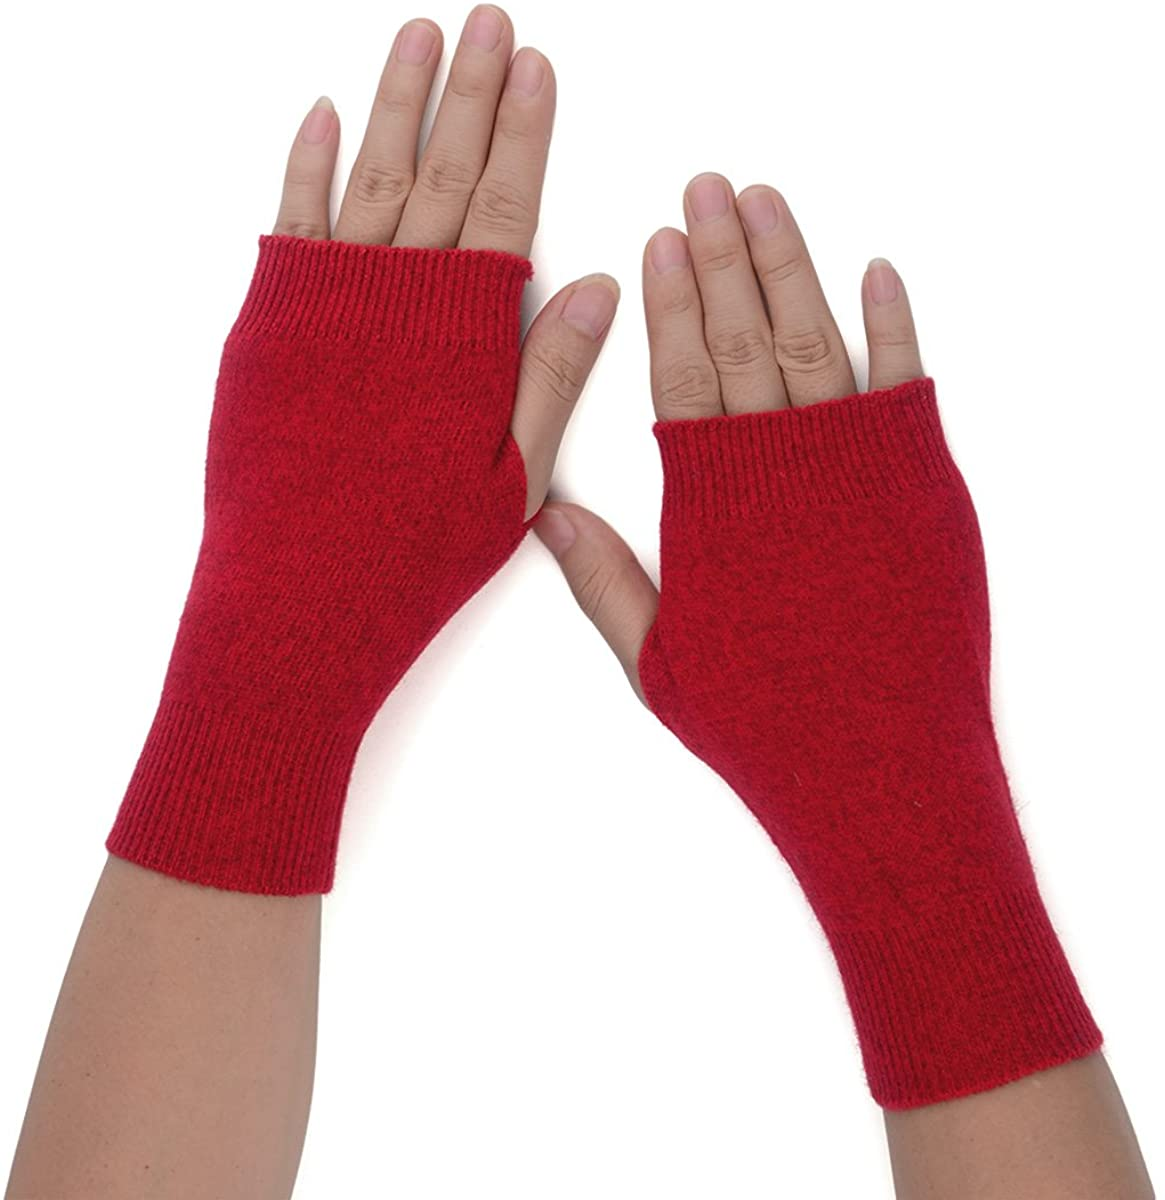 Flammi Women's Knit Fingerless Gloves Cashmere Mittens Warm Thumb Hole Gloves